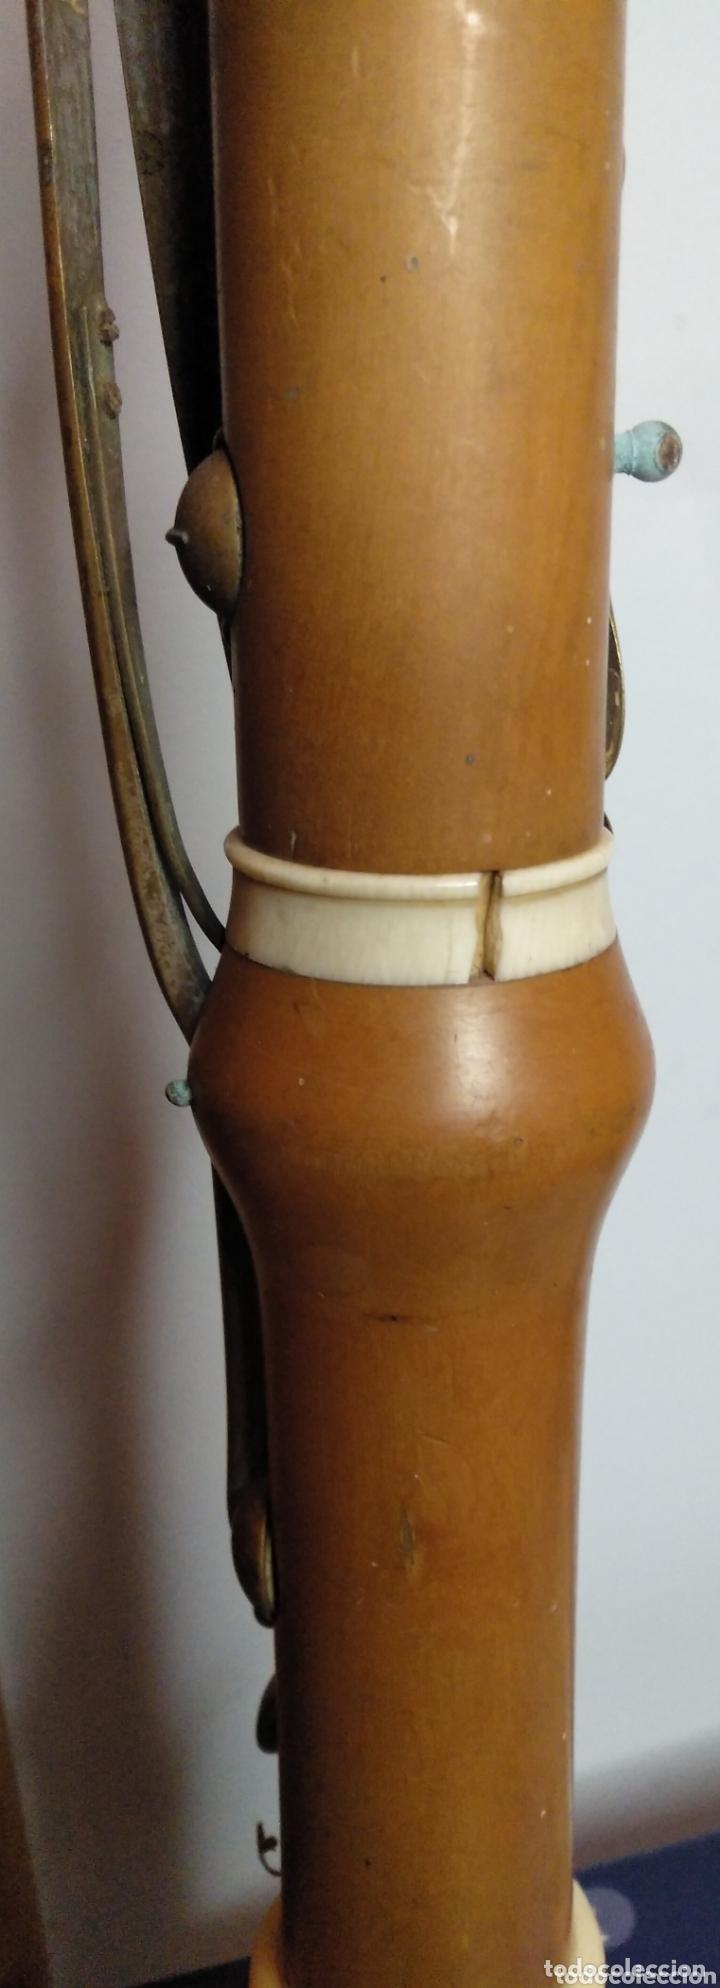 Instrumentos musicales: Clarinete Gautrot boj y marfil - Foto 7 - 172658045